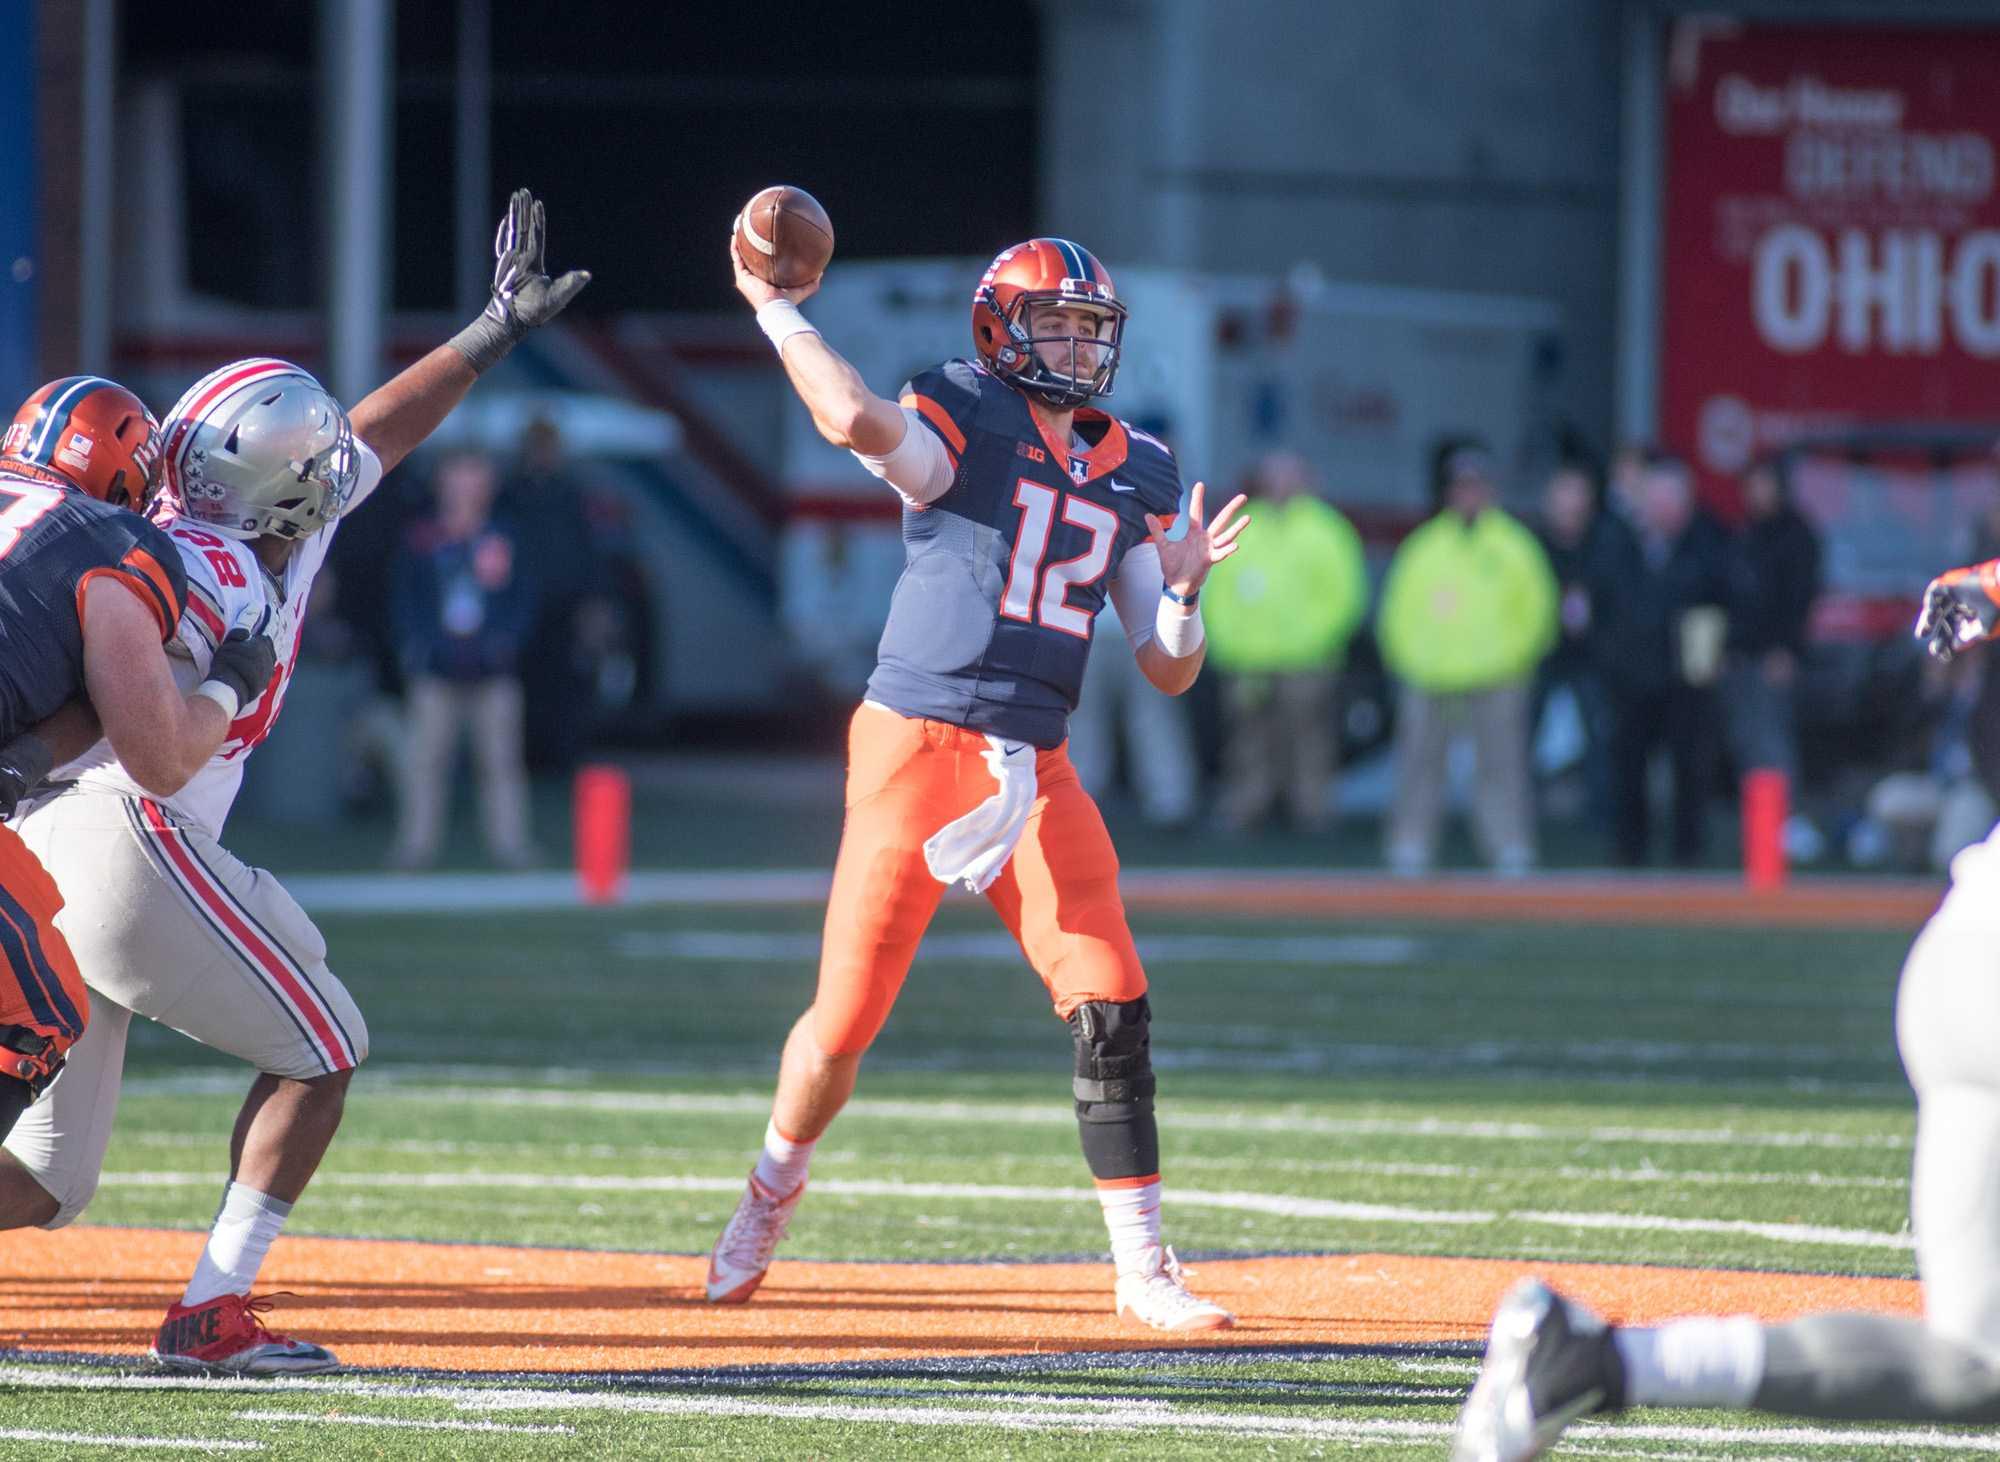 Quarterback Wes Lunt throws a pass during Saturday's game against Ohio State at Memorial Stadium. Illinois lost 28-3.